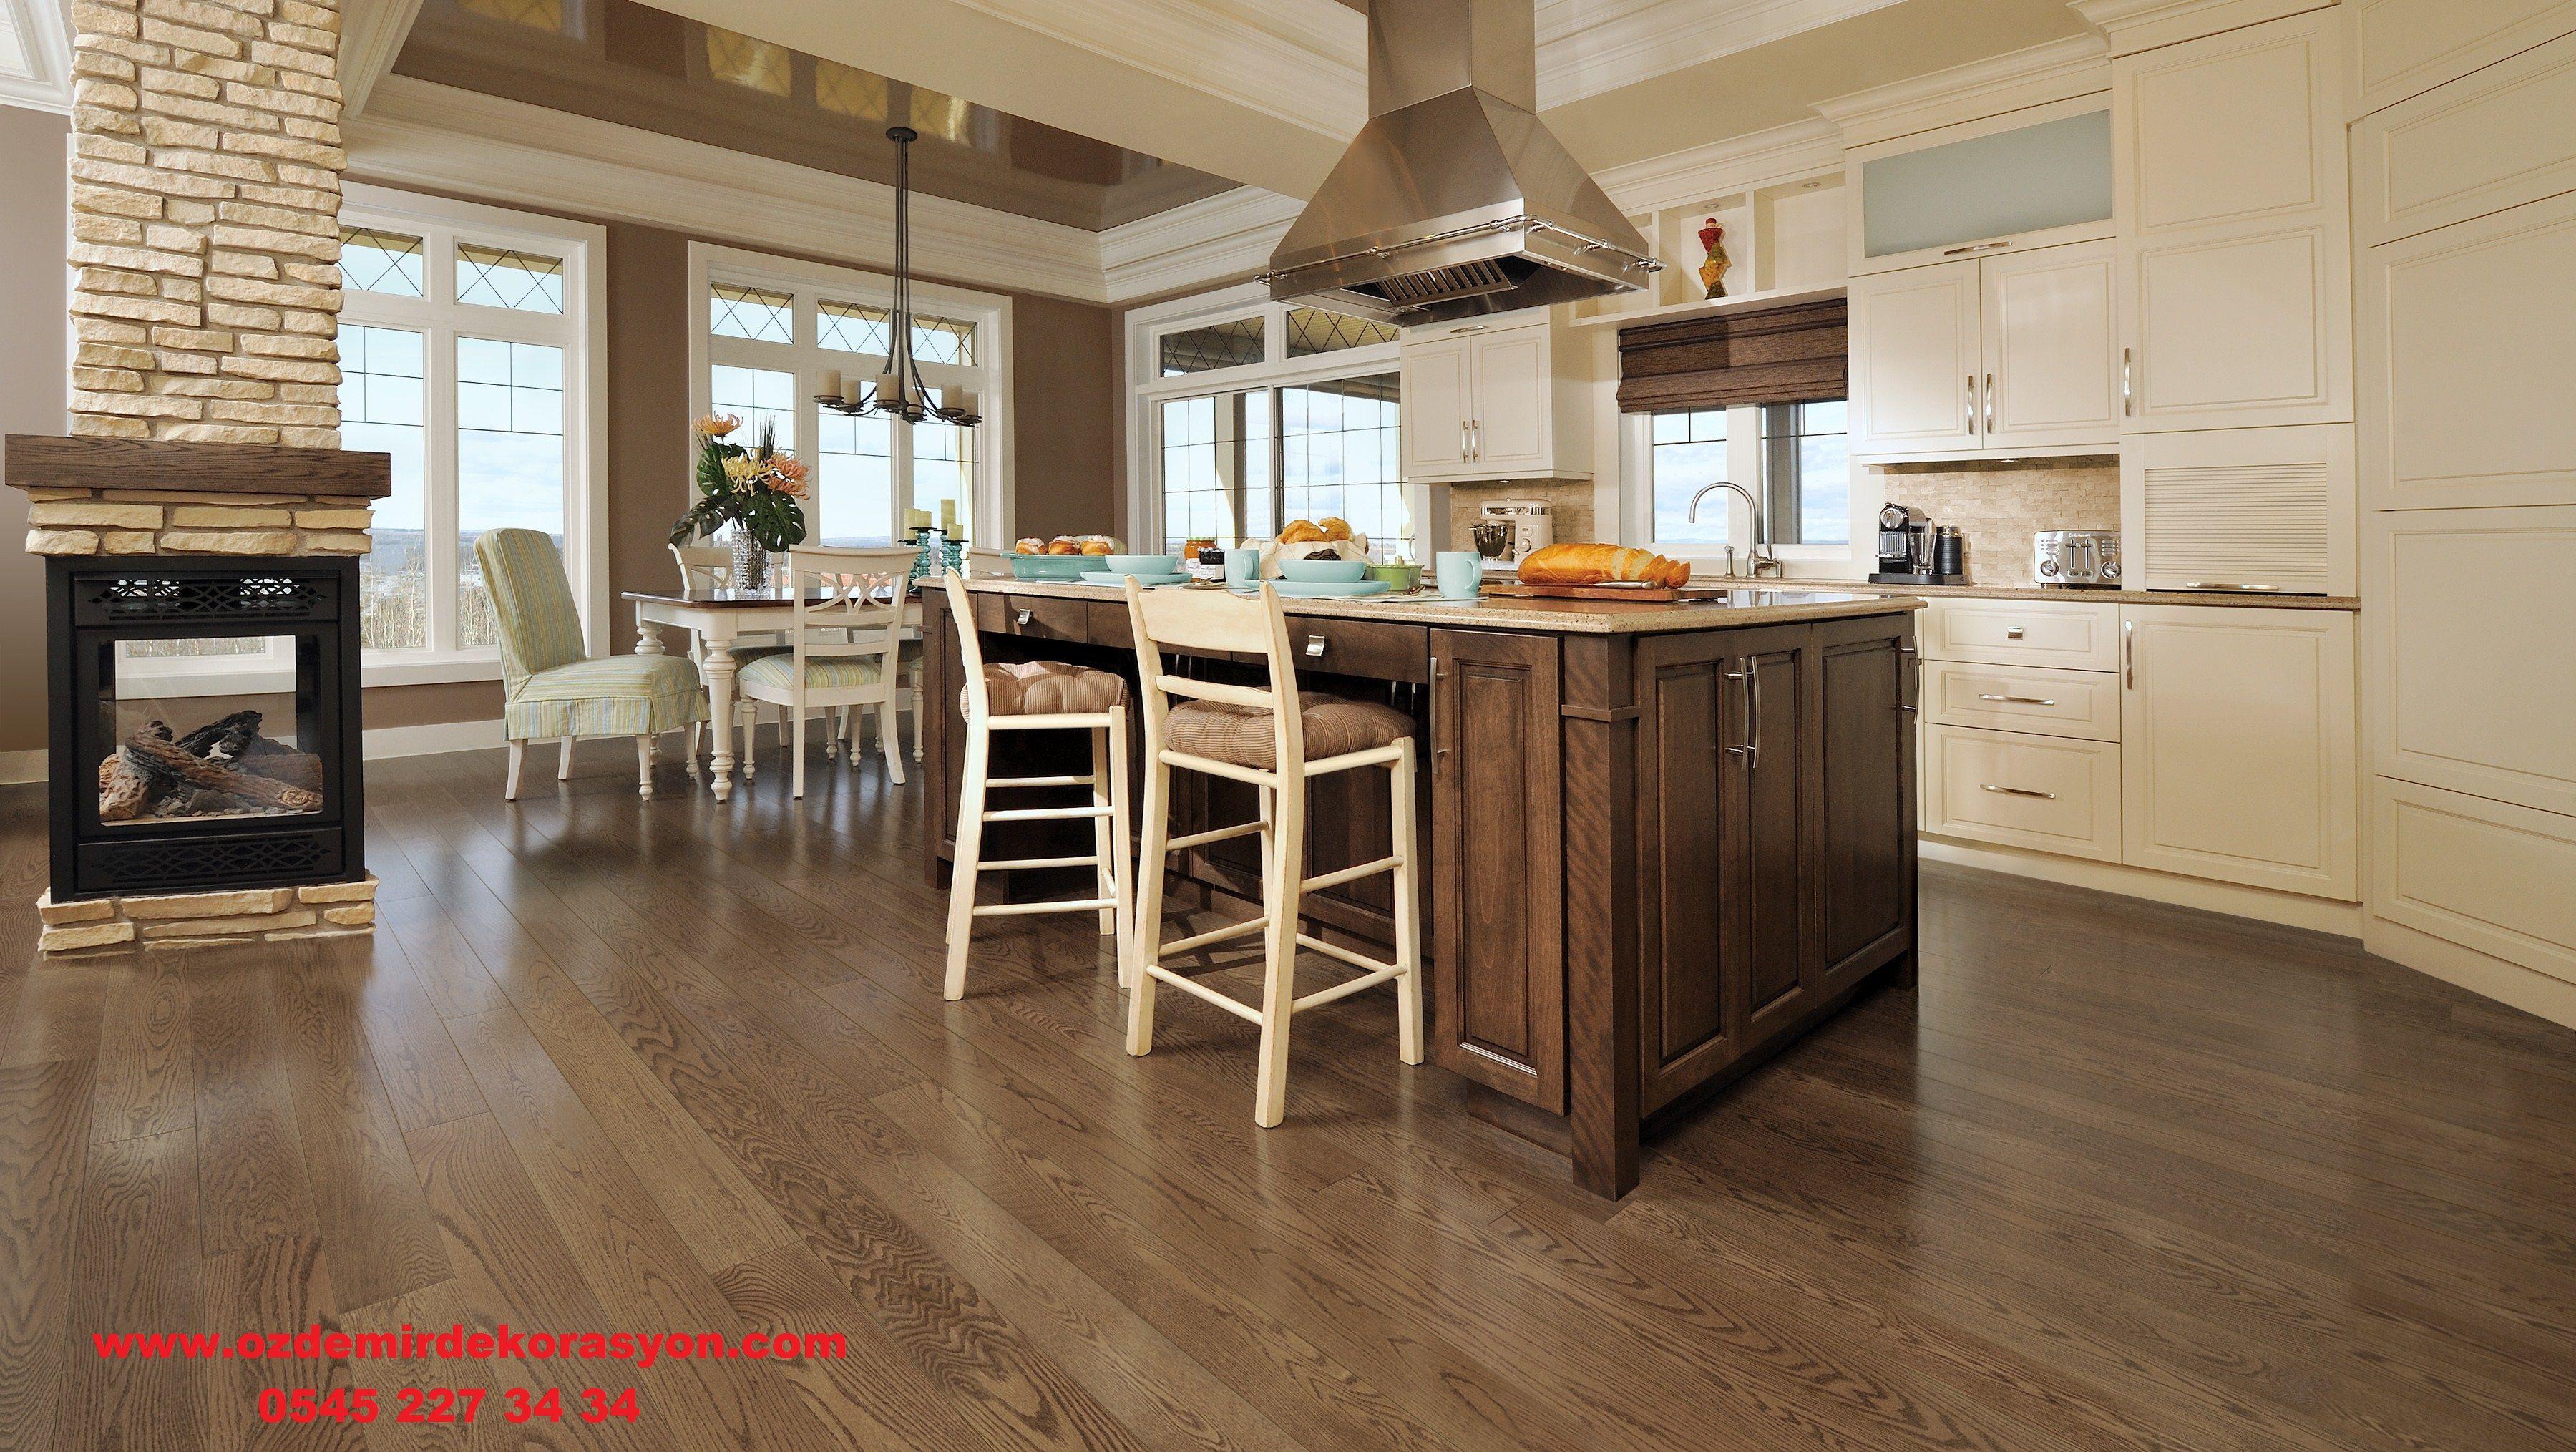 hardwood floor refinishing calgary of http www ozdemirdekorasyon com iletiaŸim0545 227 34 34 laminat for explore best wood flooring and more